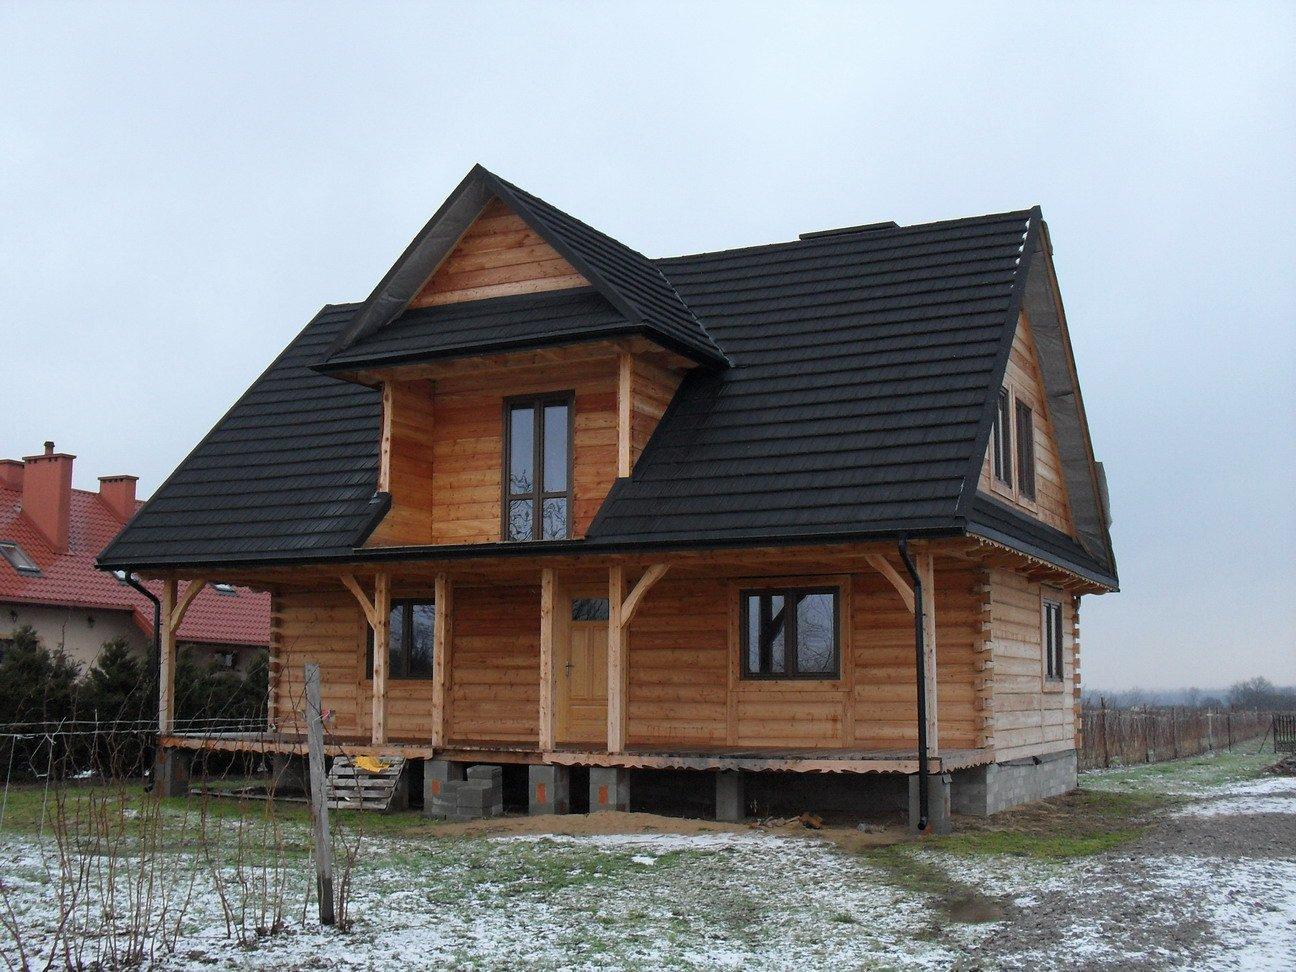 projekt-domu-ranczo-realizacja-fot-1-1370934373-fiixyacb.jpg